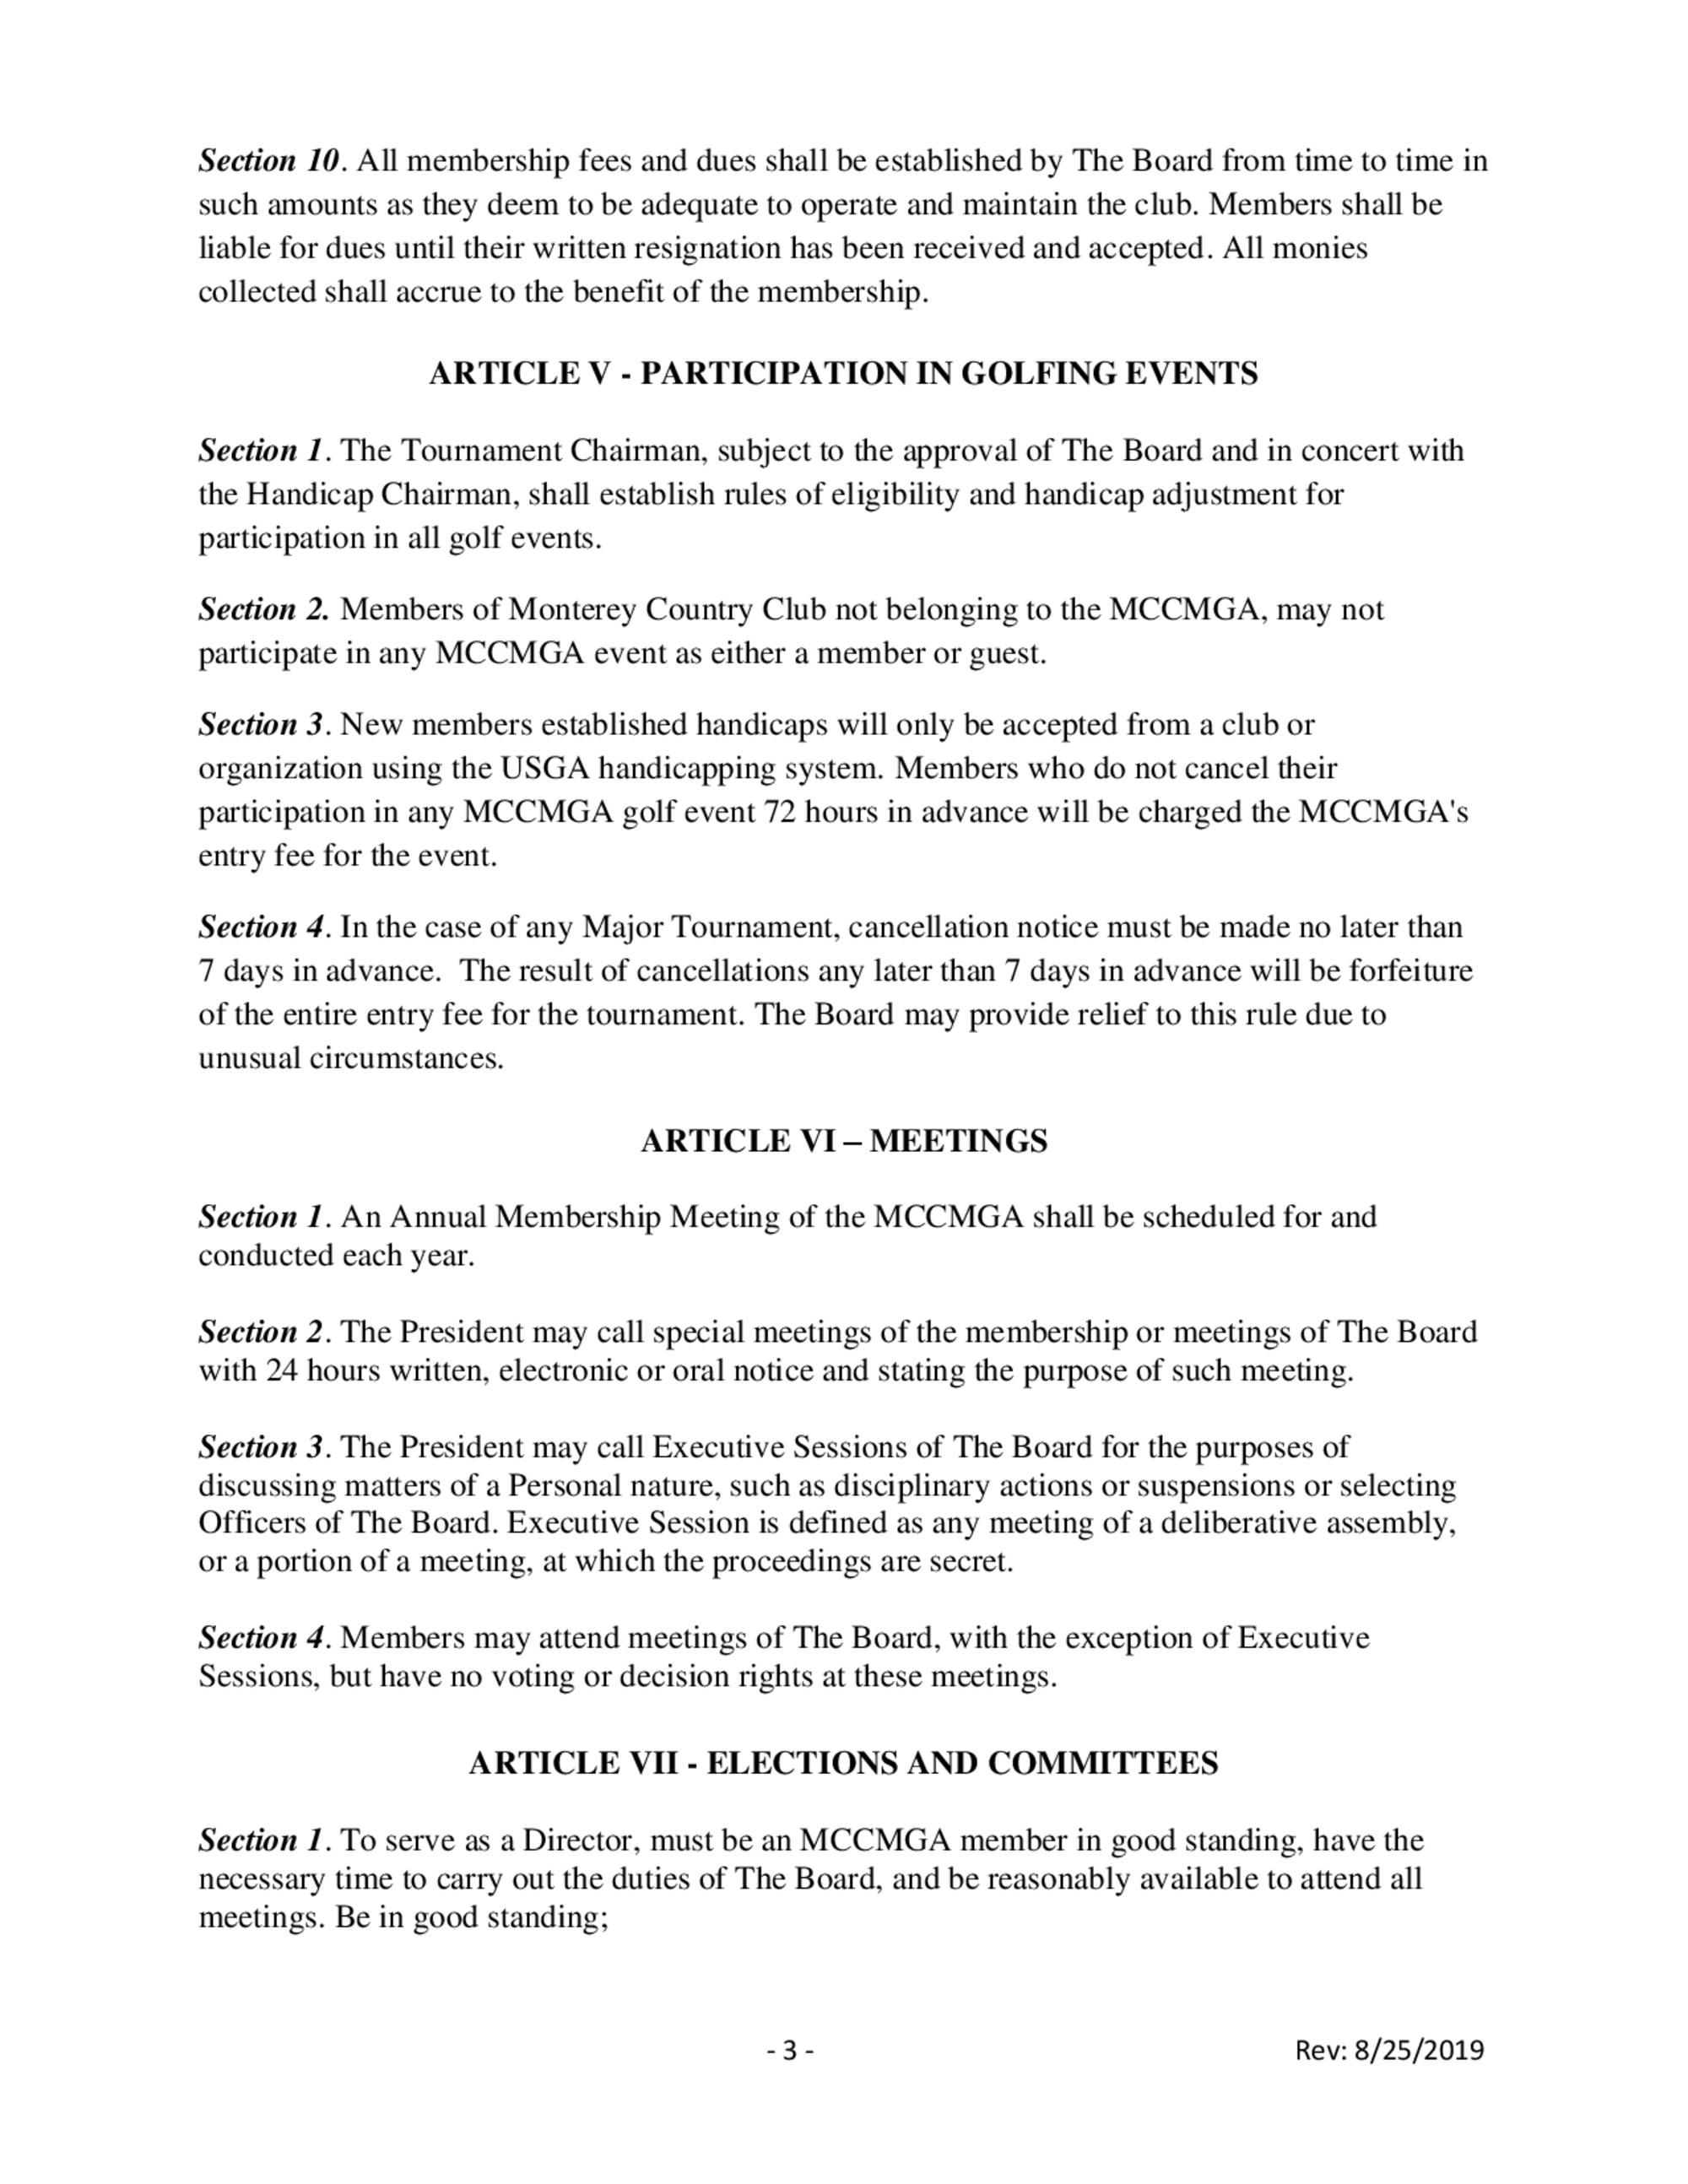 Mcc bylaws final 3